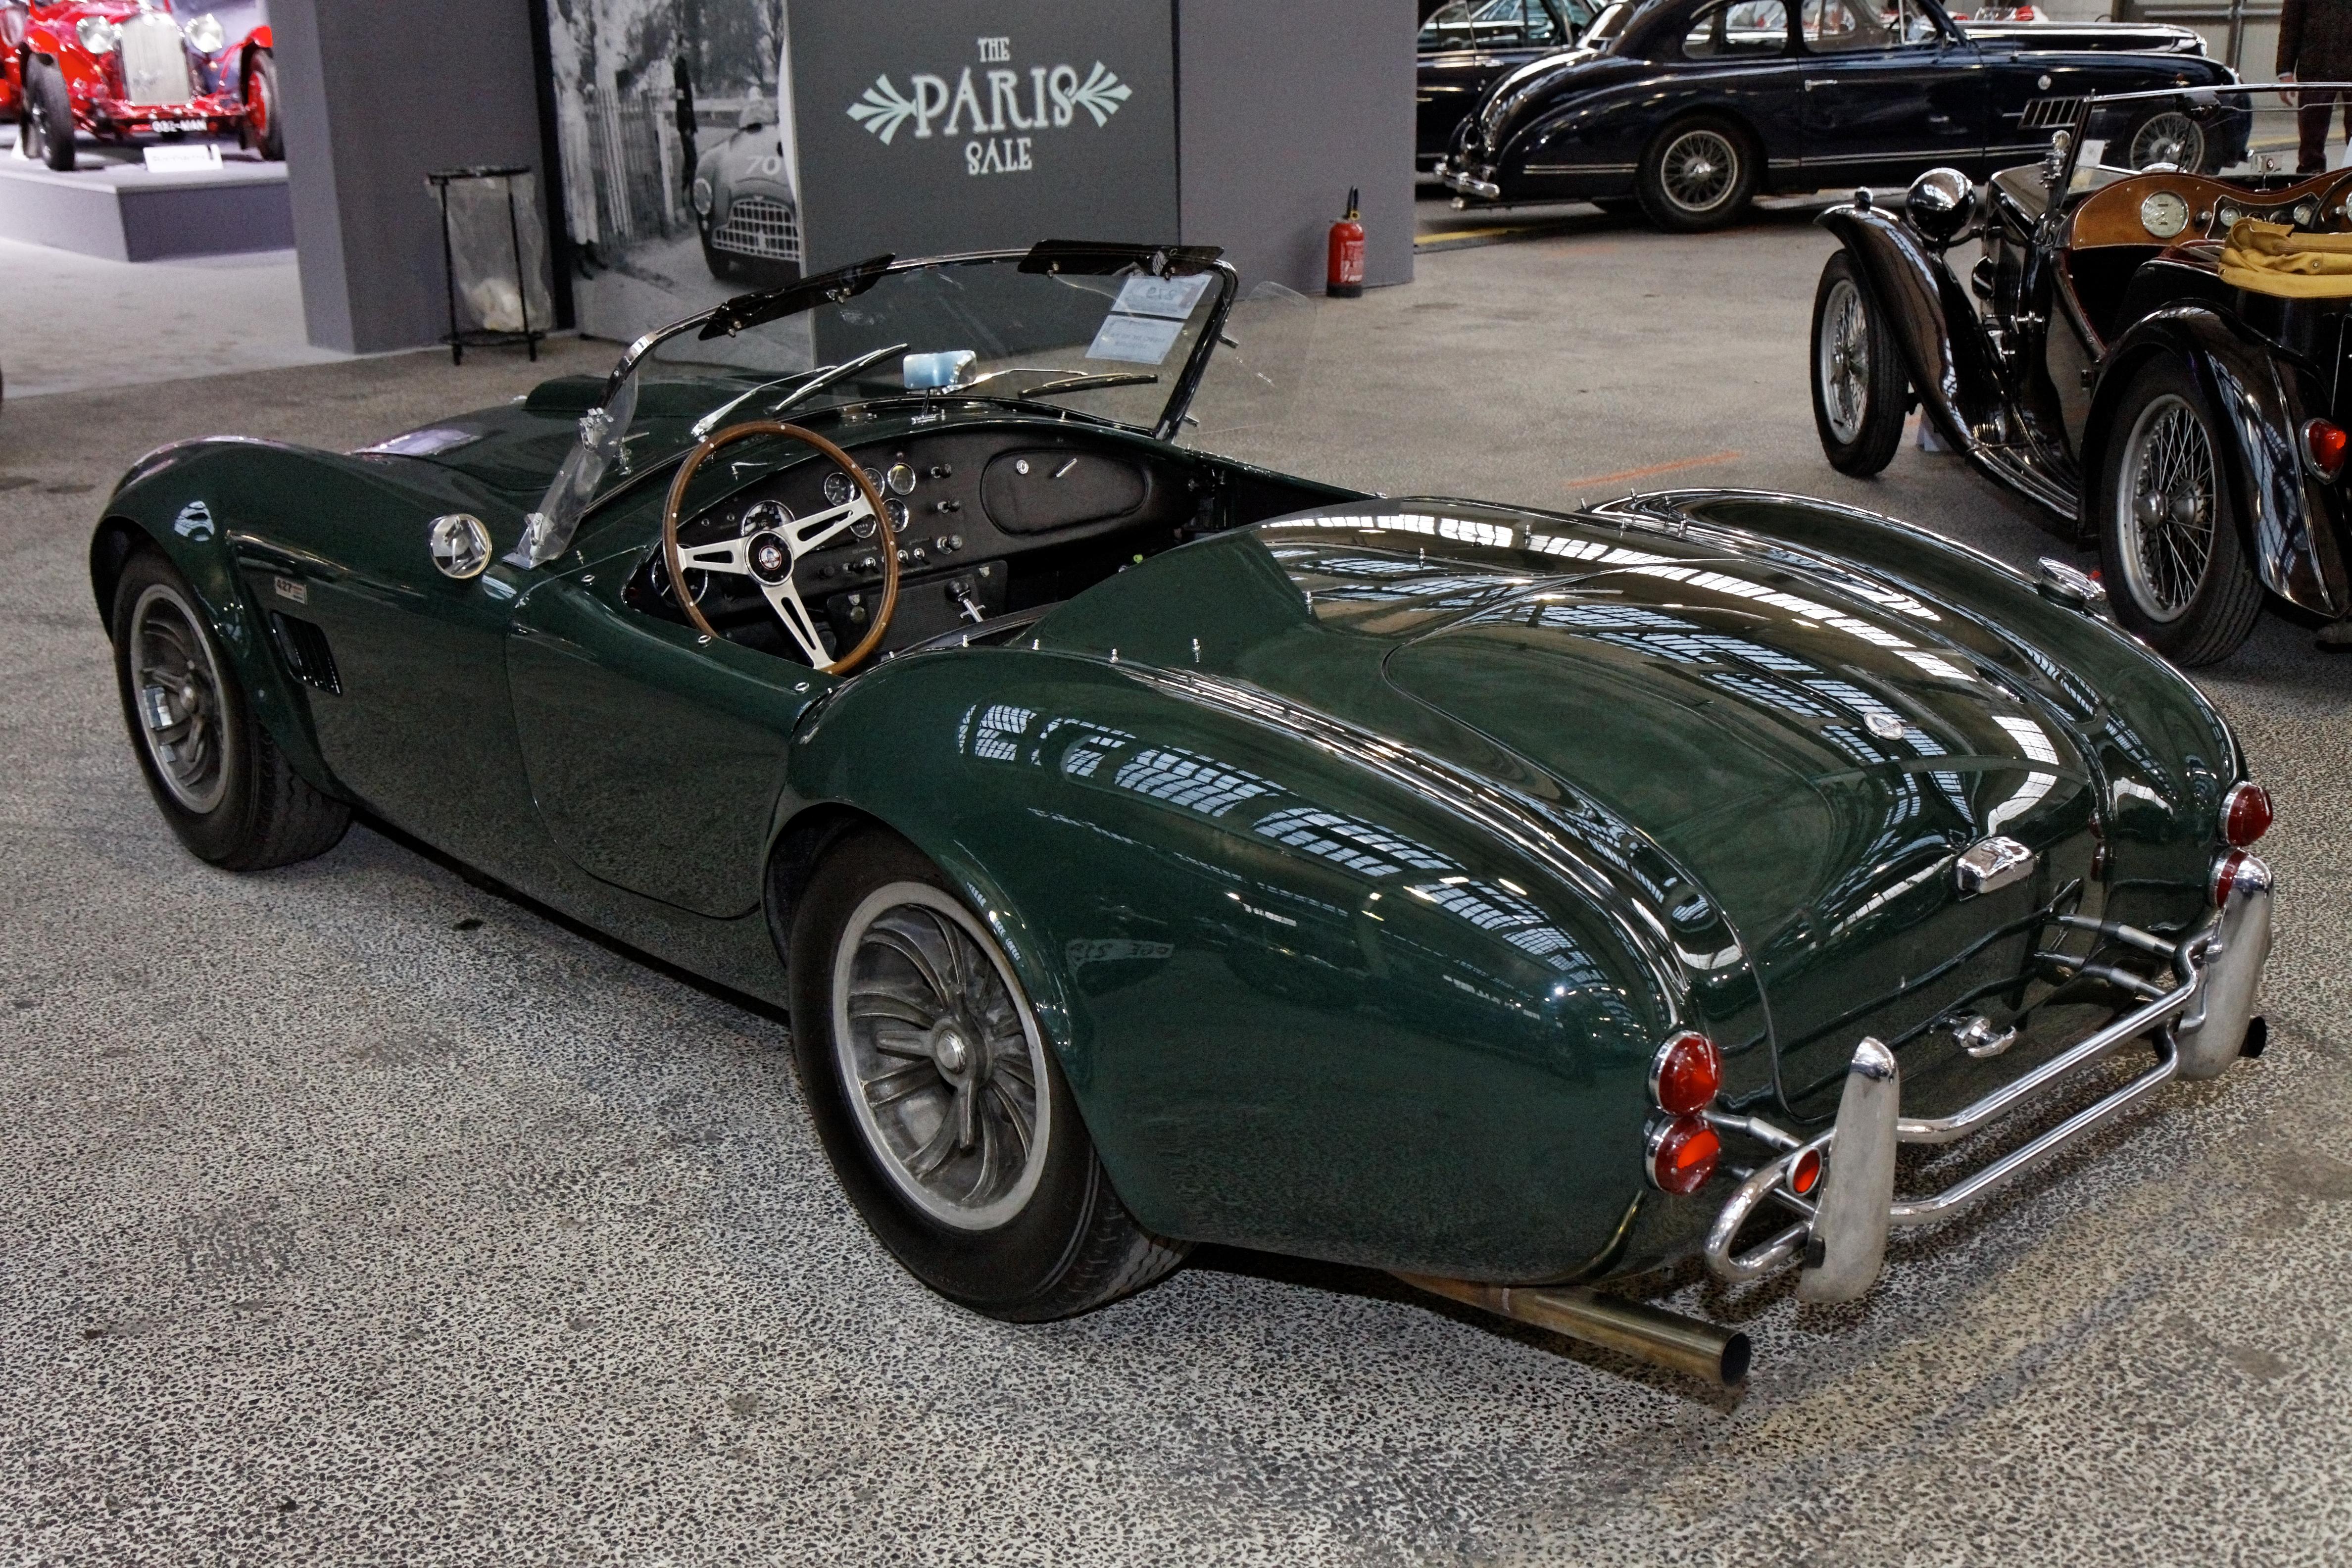 File:Bonhams - The Paris Sale 2012 - AC Shelby Cobra '427